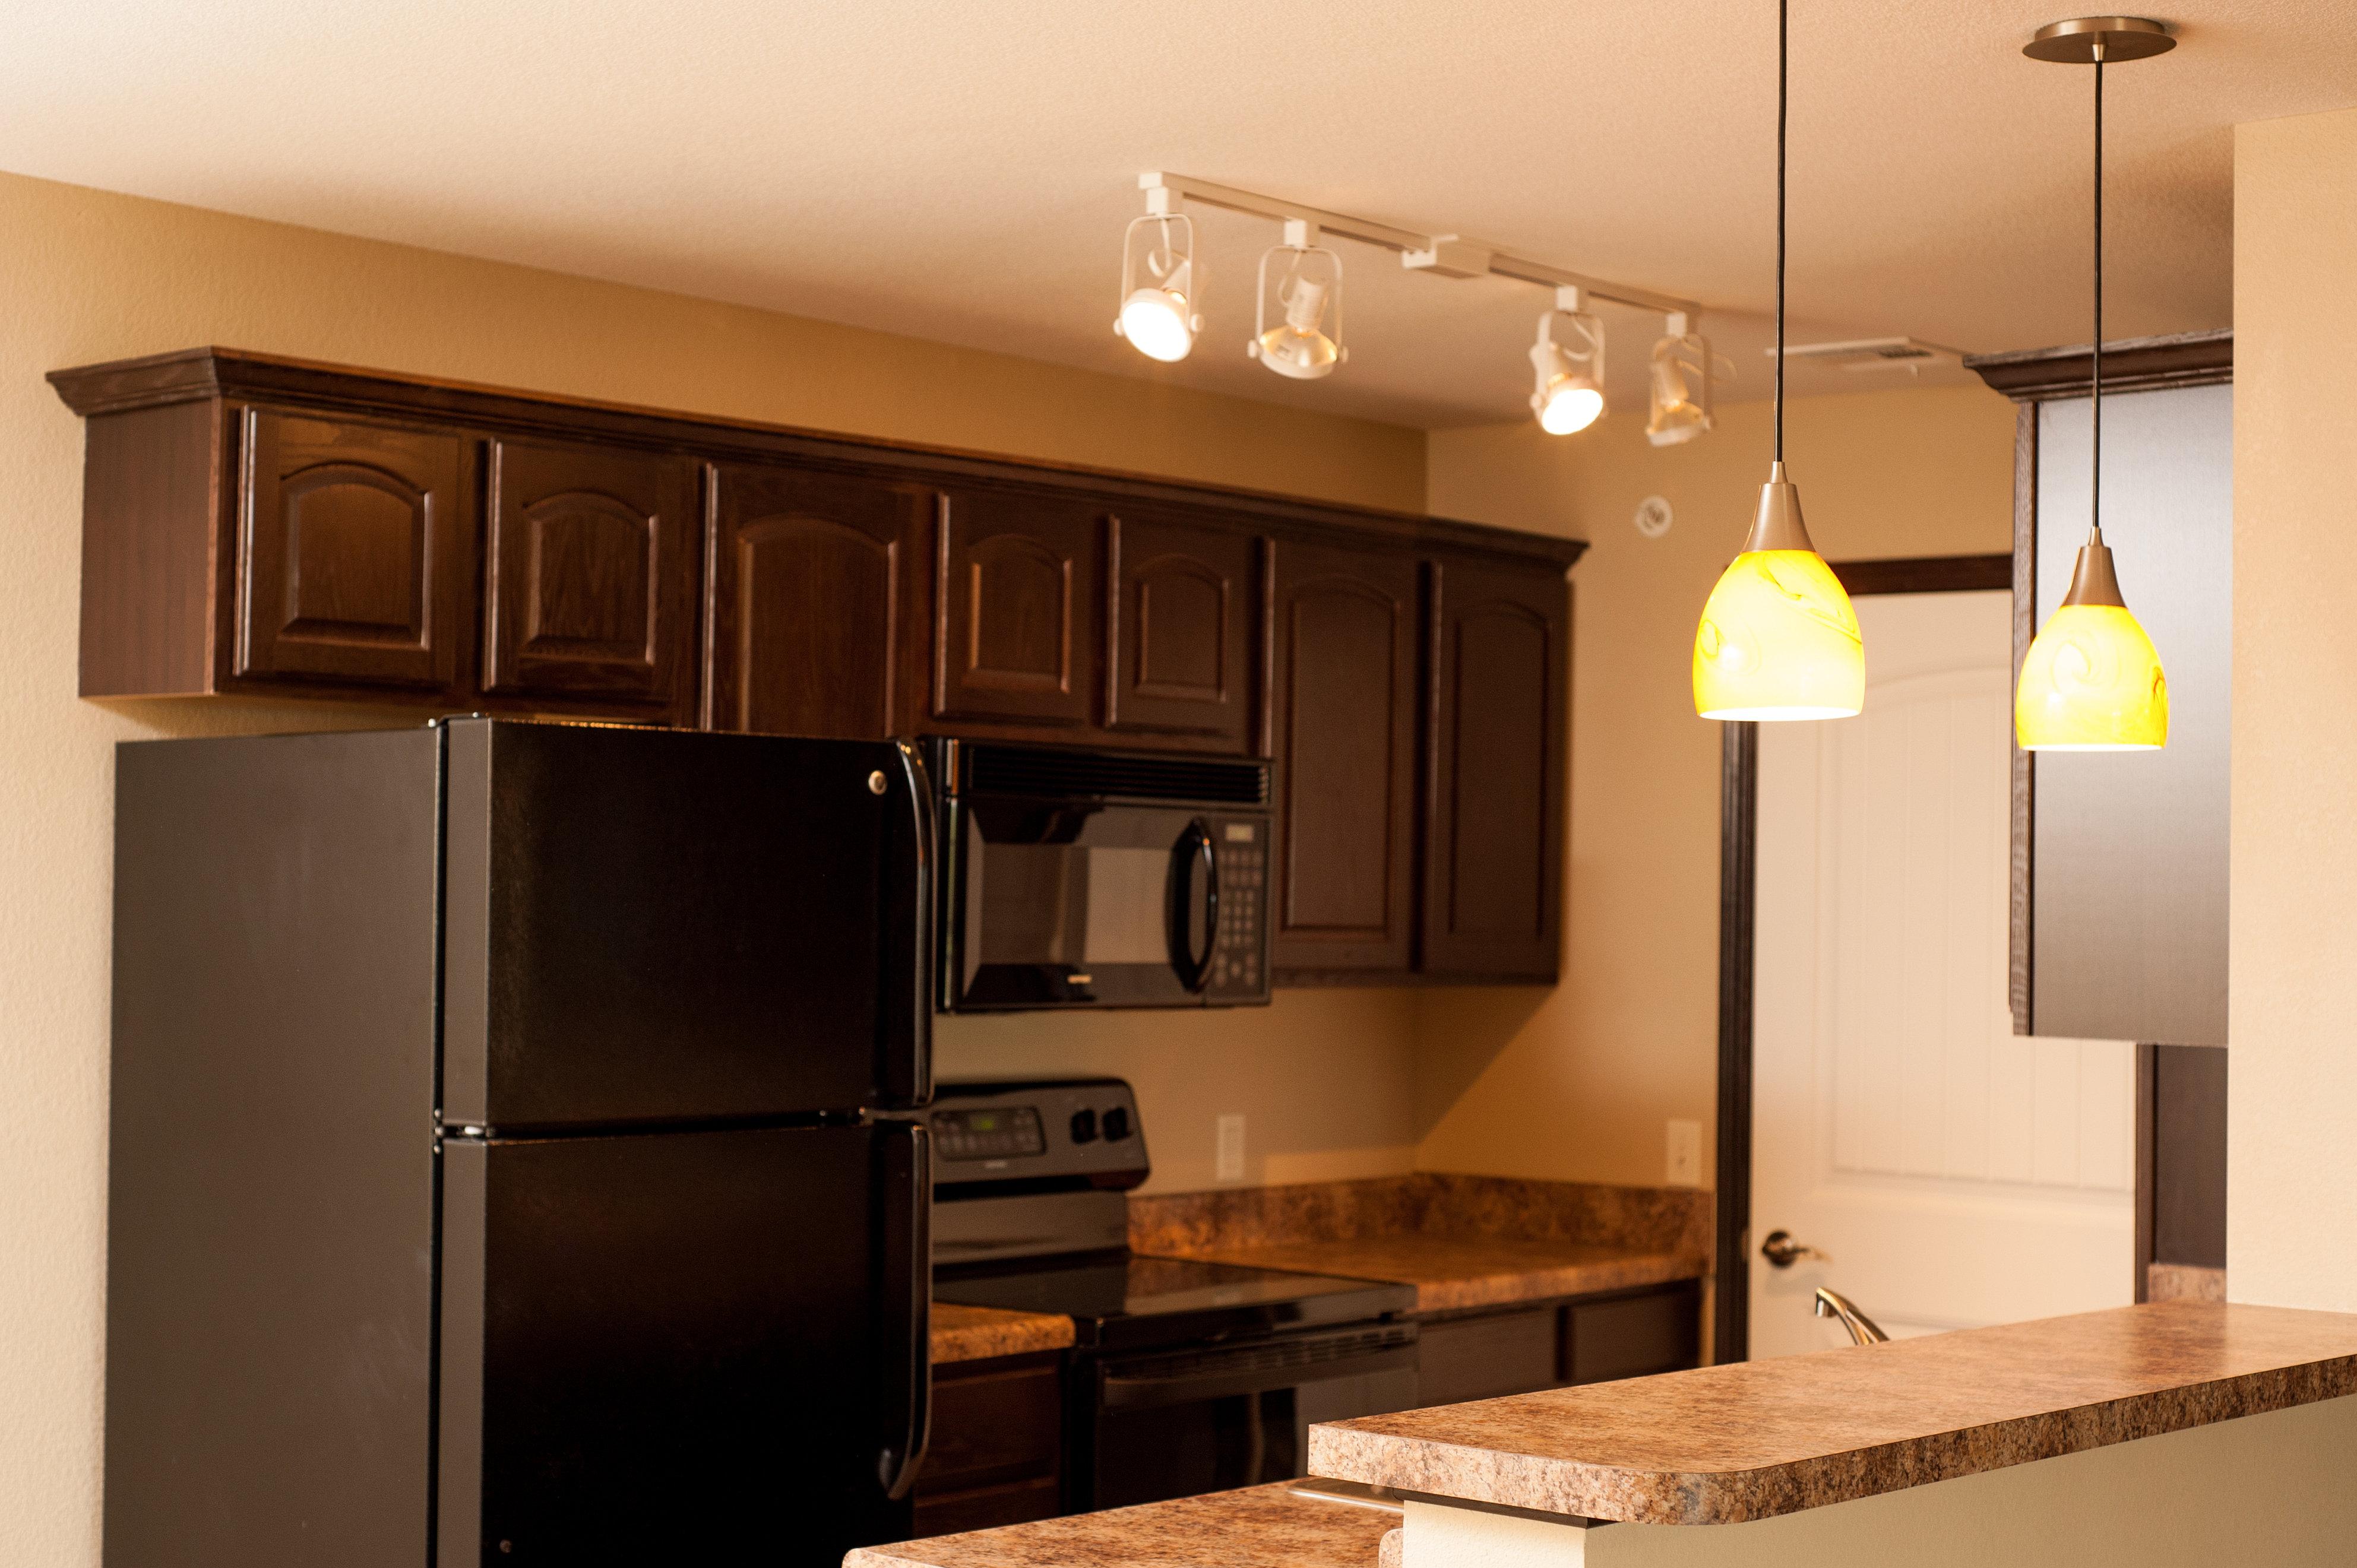 Apartment Kitchen Webbcityplaza Apartment Kitchen